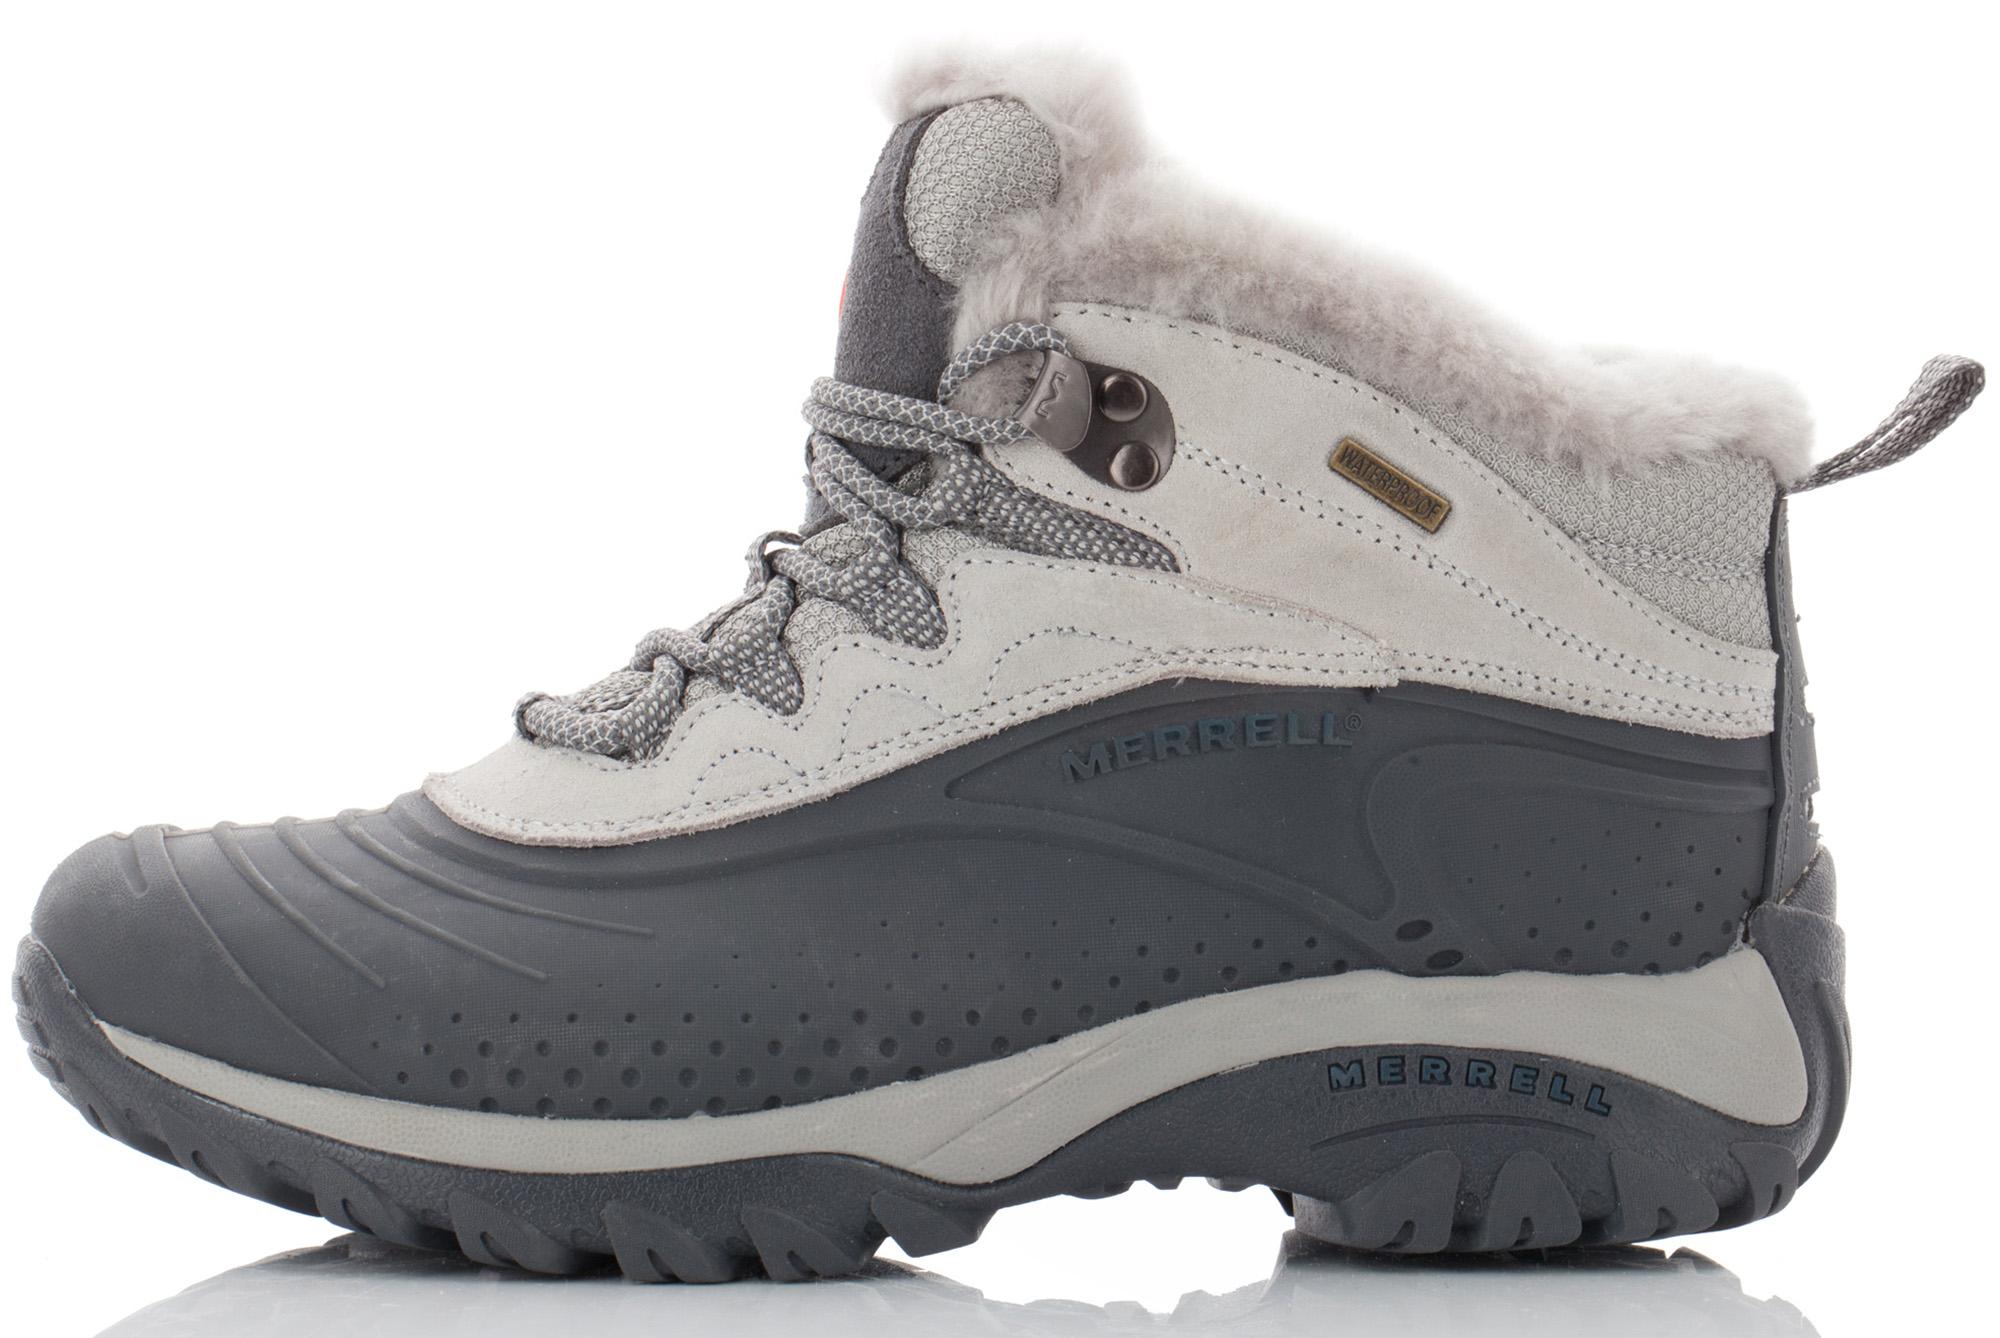 цена на Merrell Ботинки утепленные женские Merrell Storm Trekker 6, размер 37